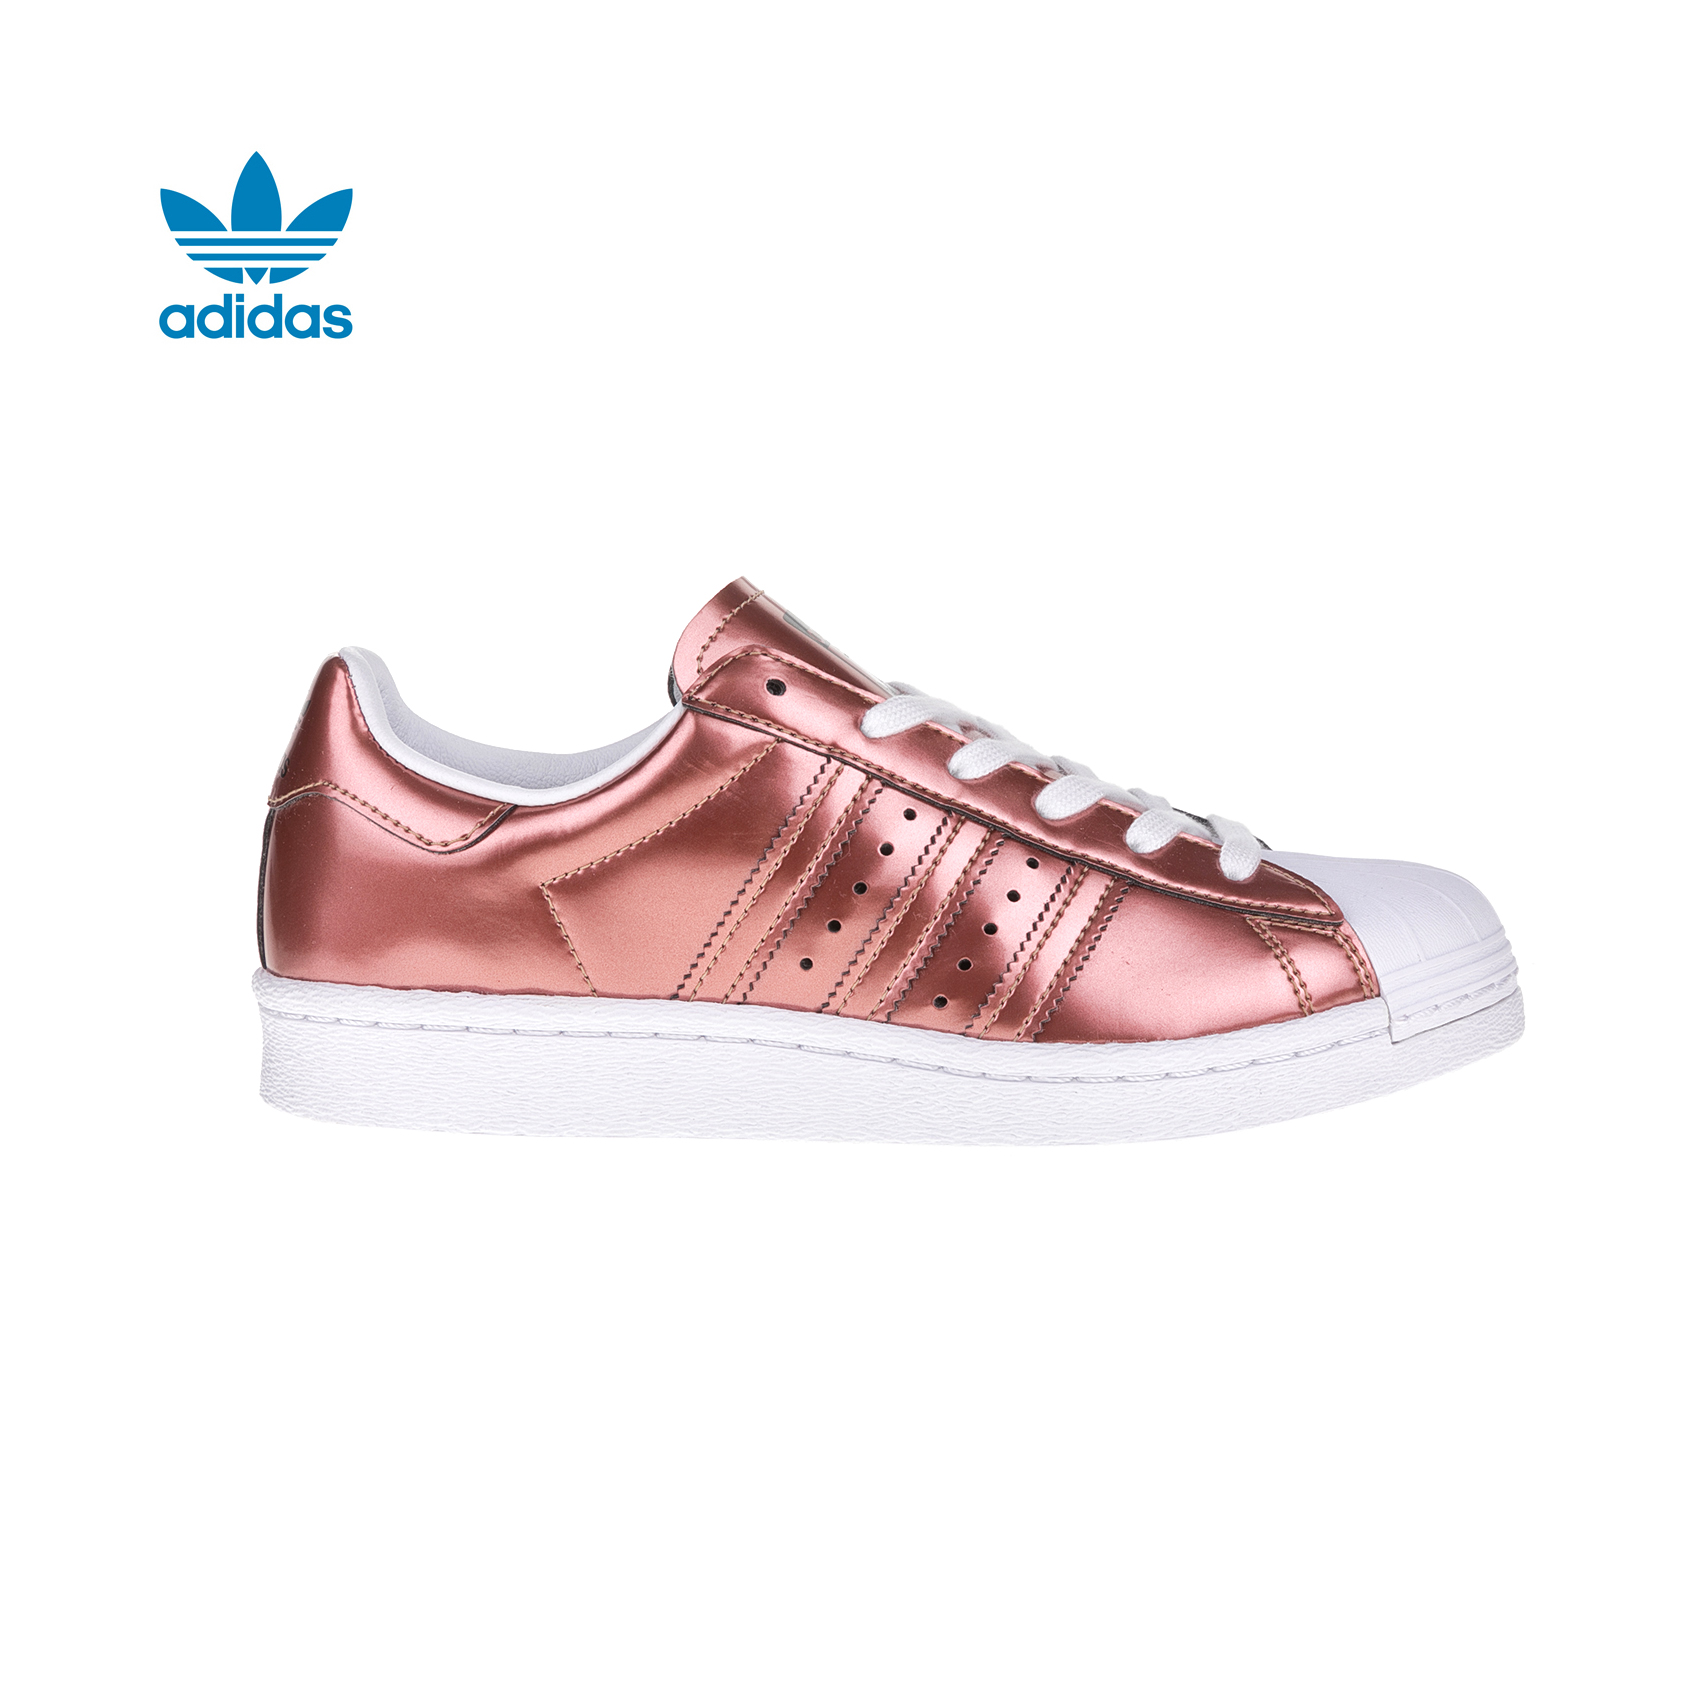 adidas Originals – Γυναικεία sneakers adidas SUPERSTAR μεταλλικά